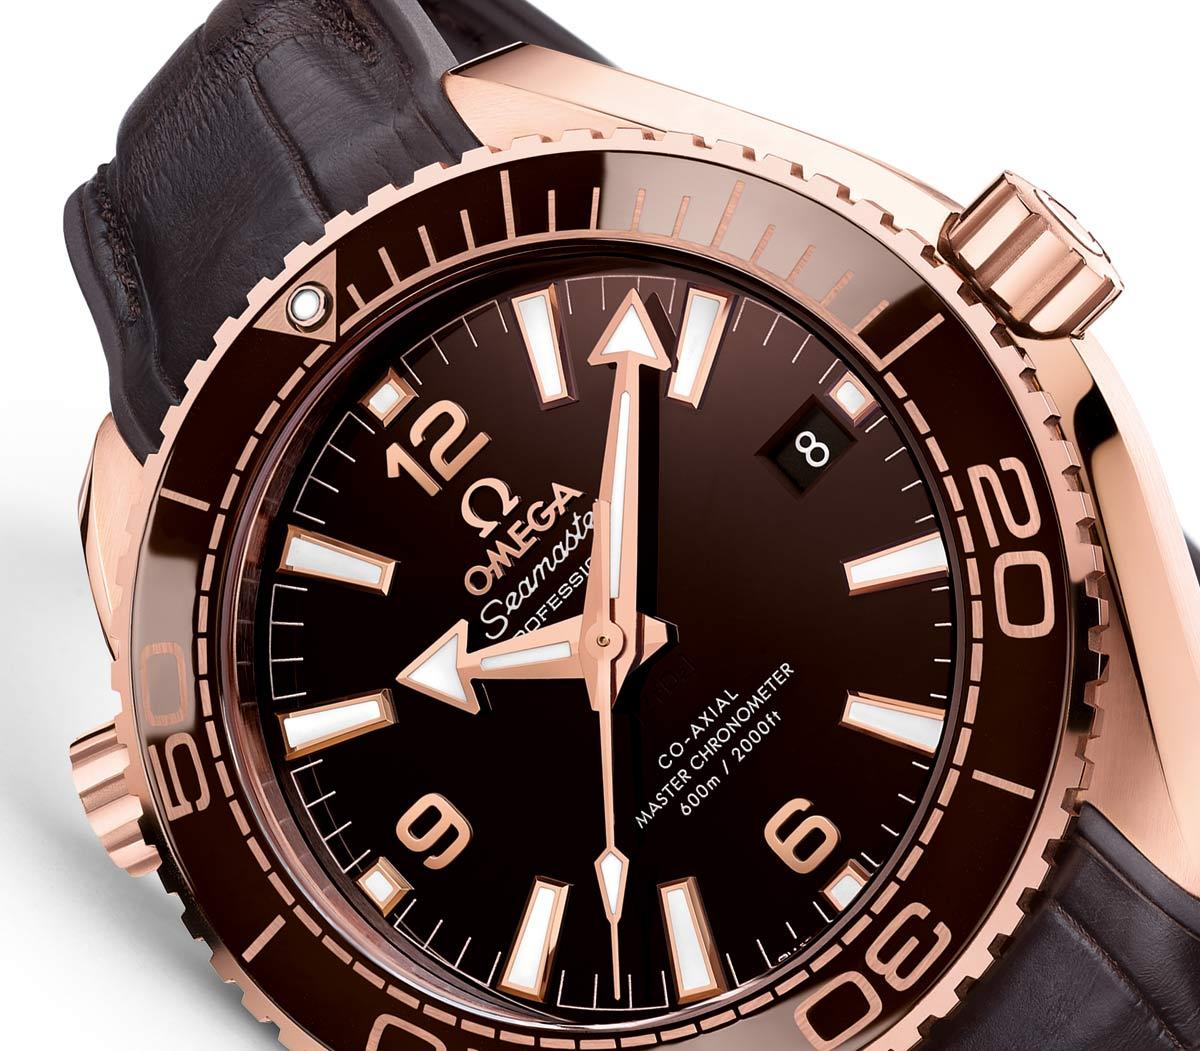 """Omega Seamaster Planet Ocean 600M Master Chronometer Watch""的图片搜索结果"